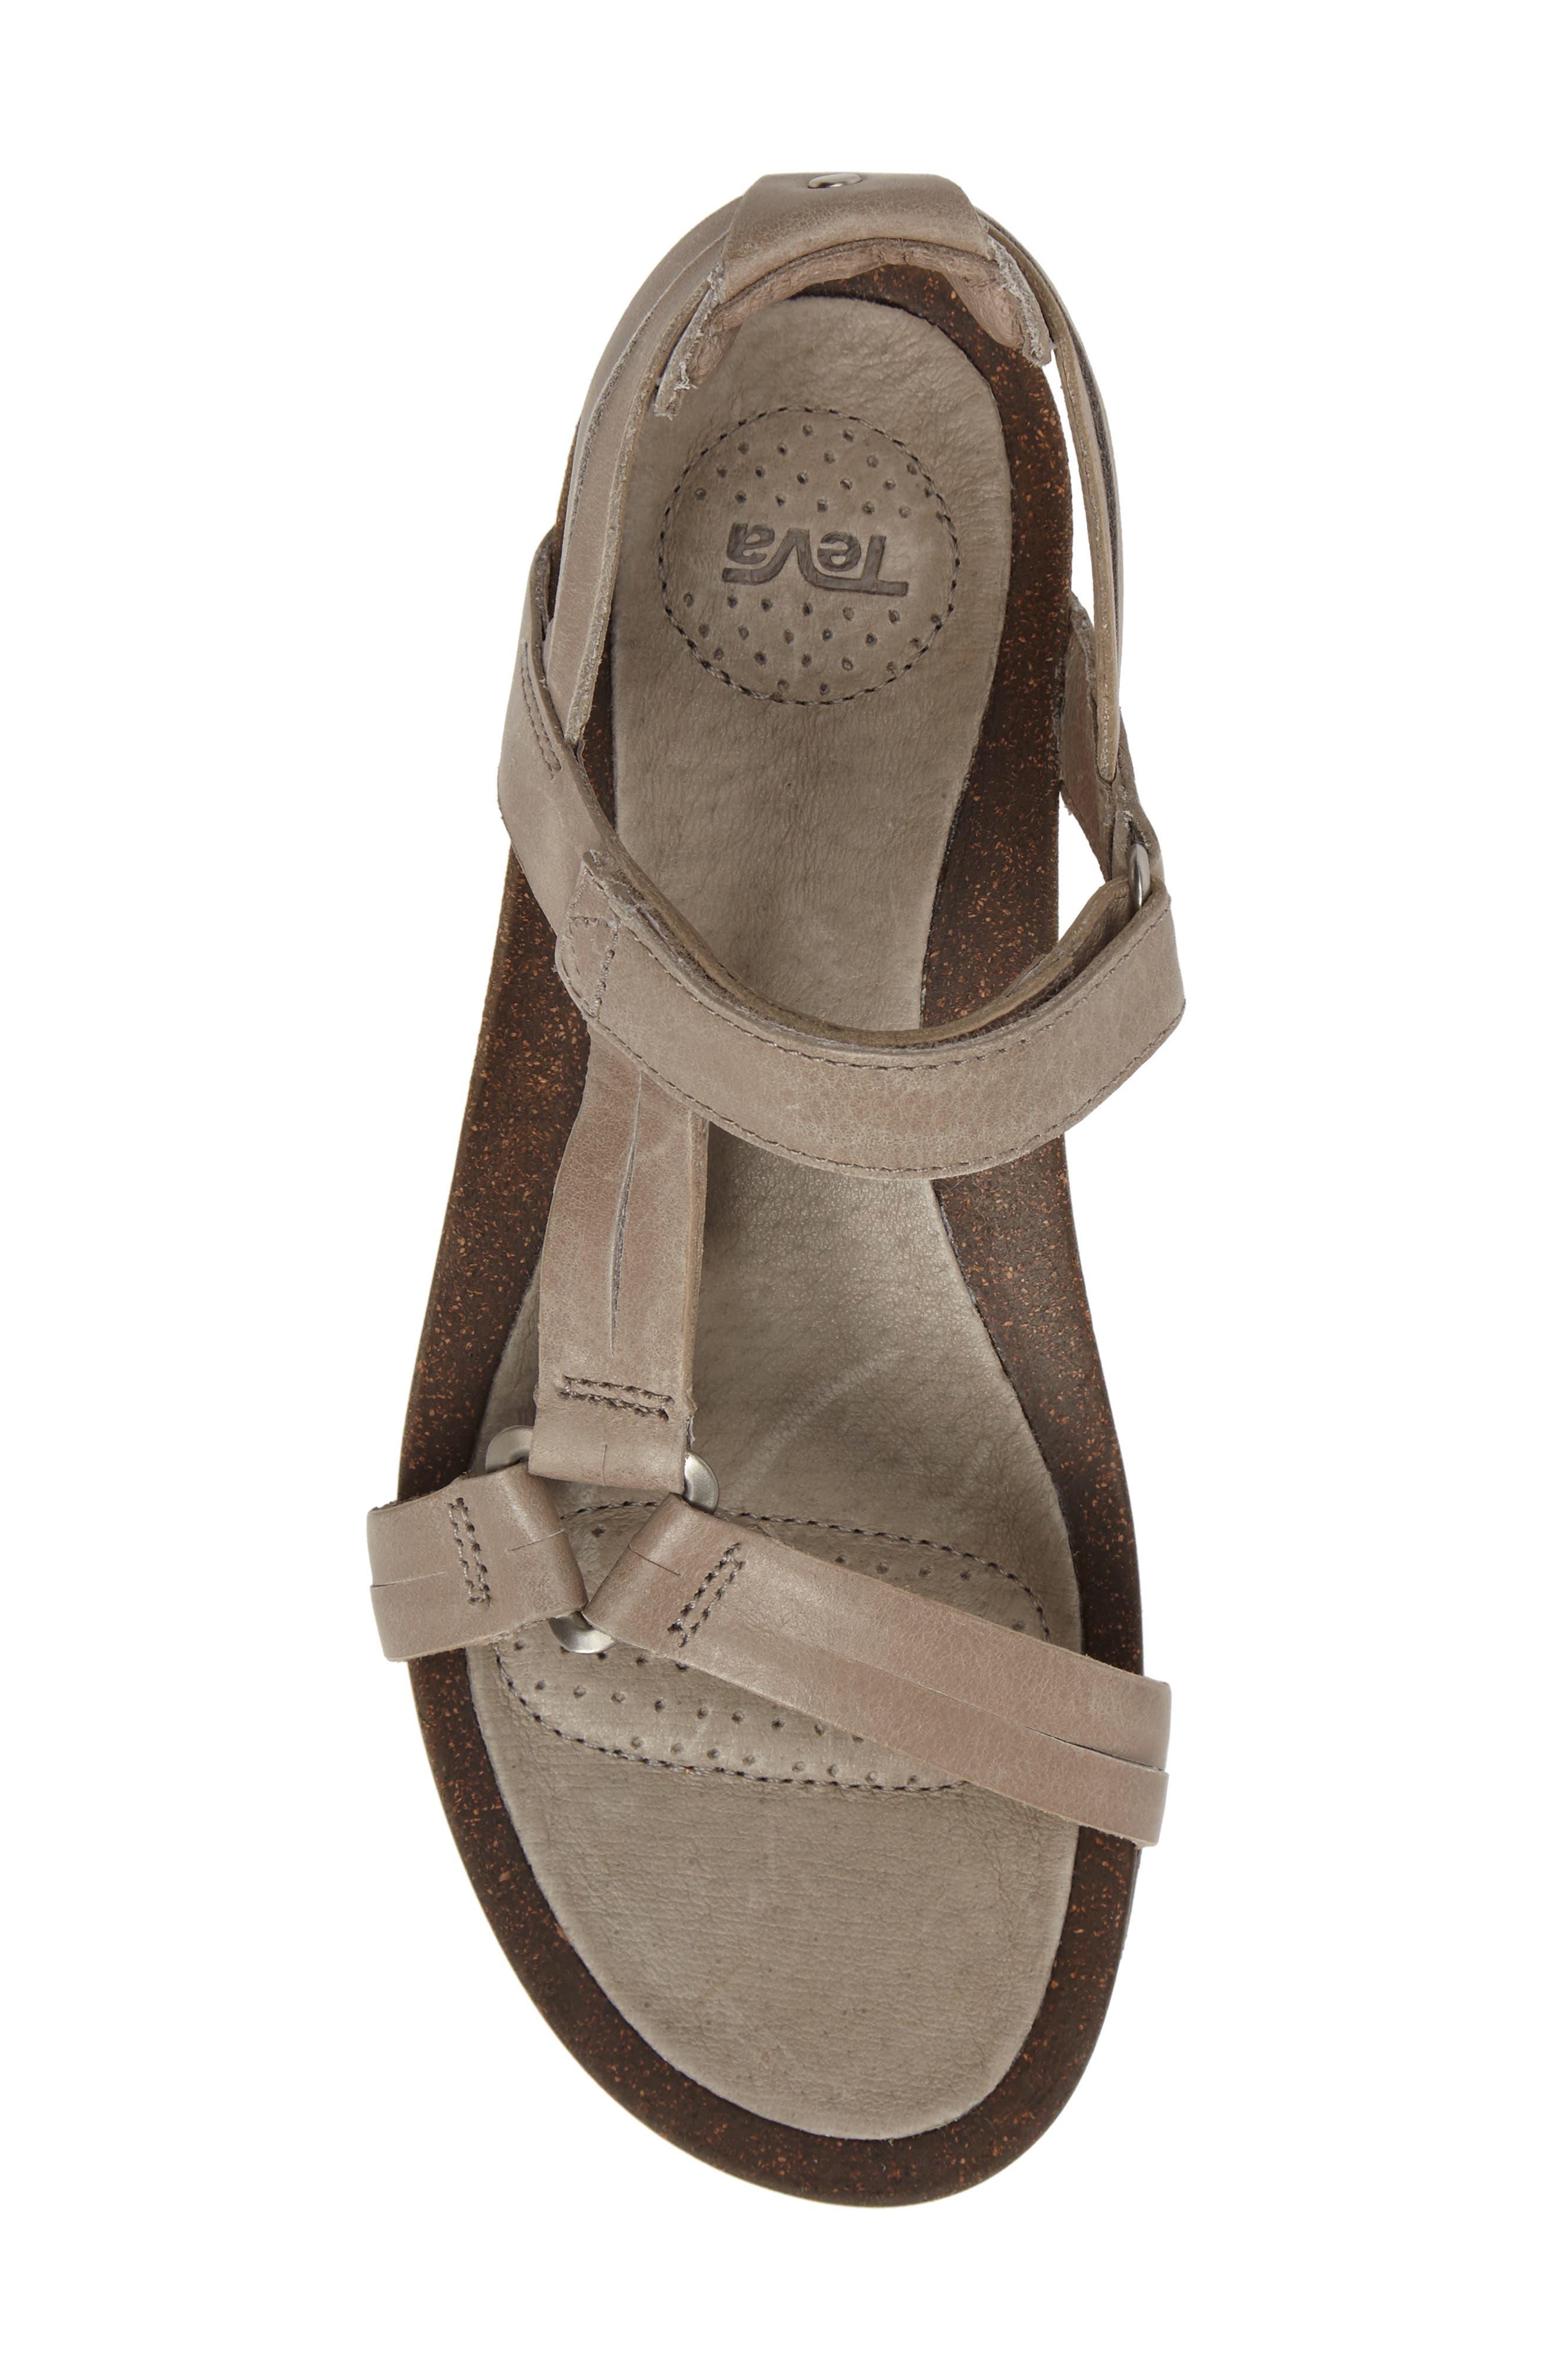 Ysidro Universal Sandal,                             Alternate thumbnail 5, color,                             026